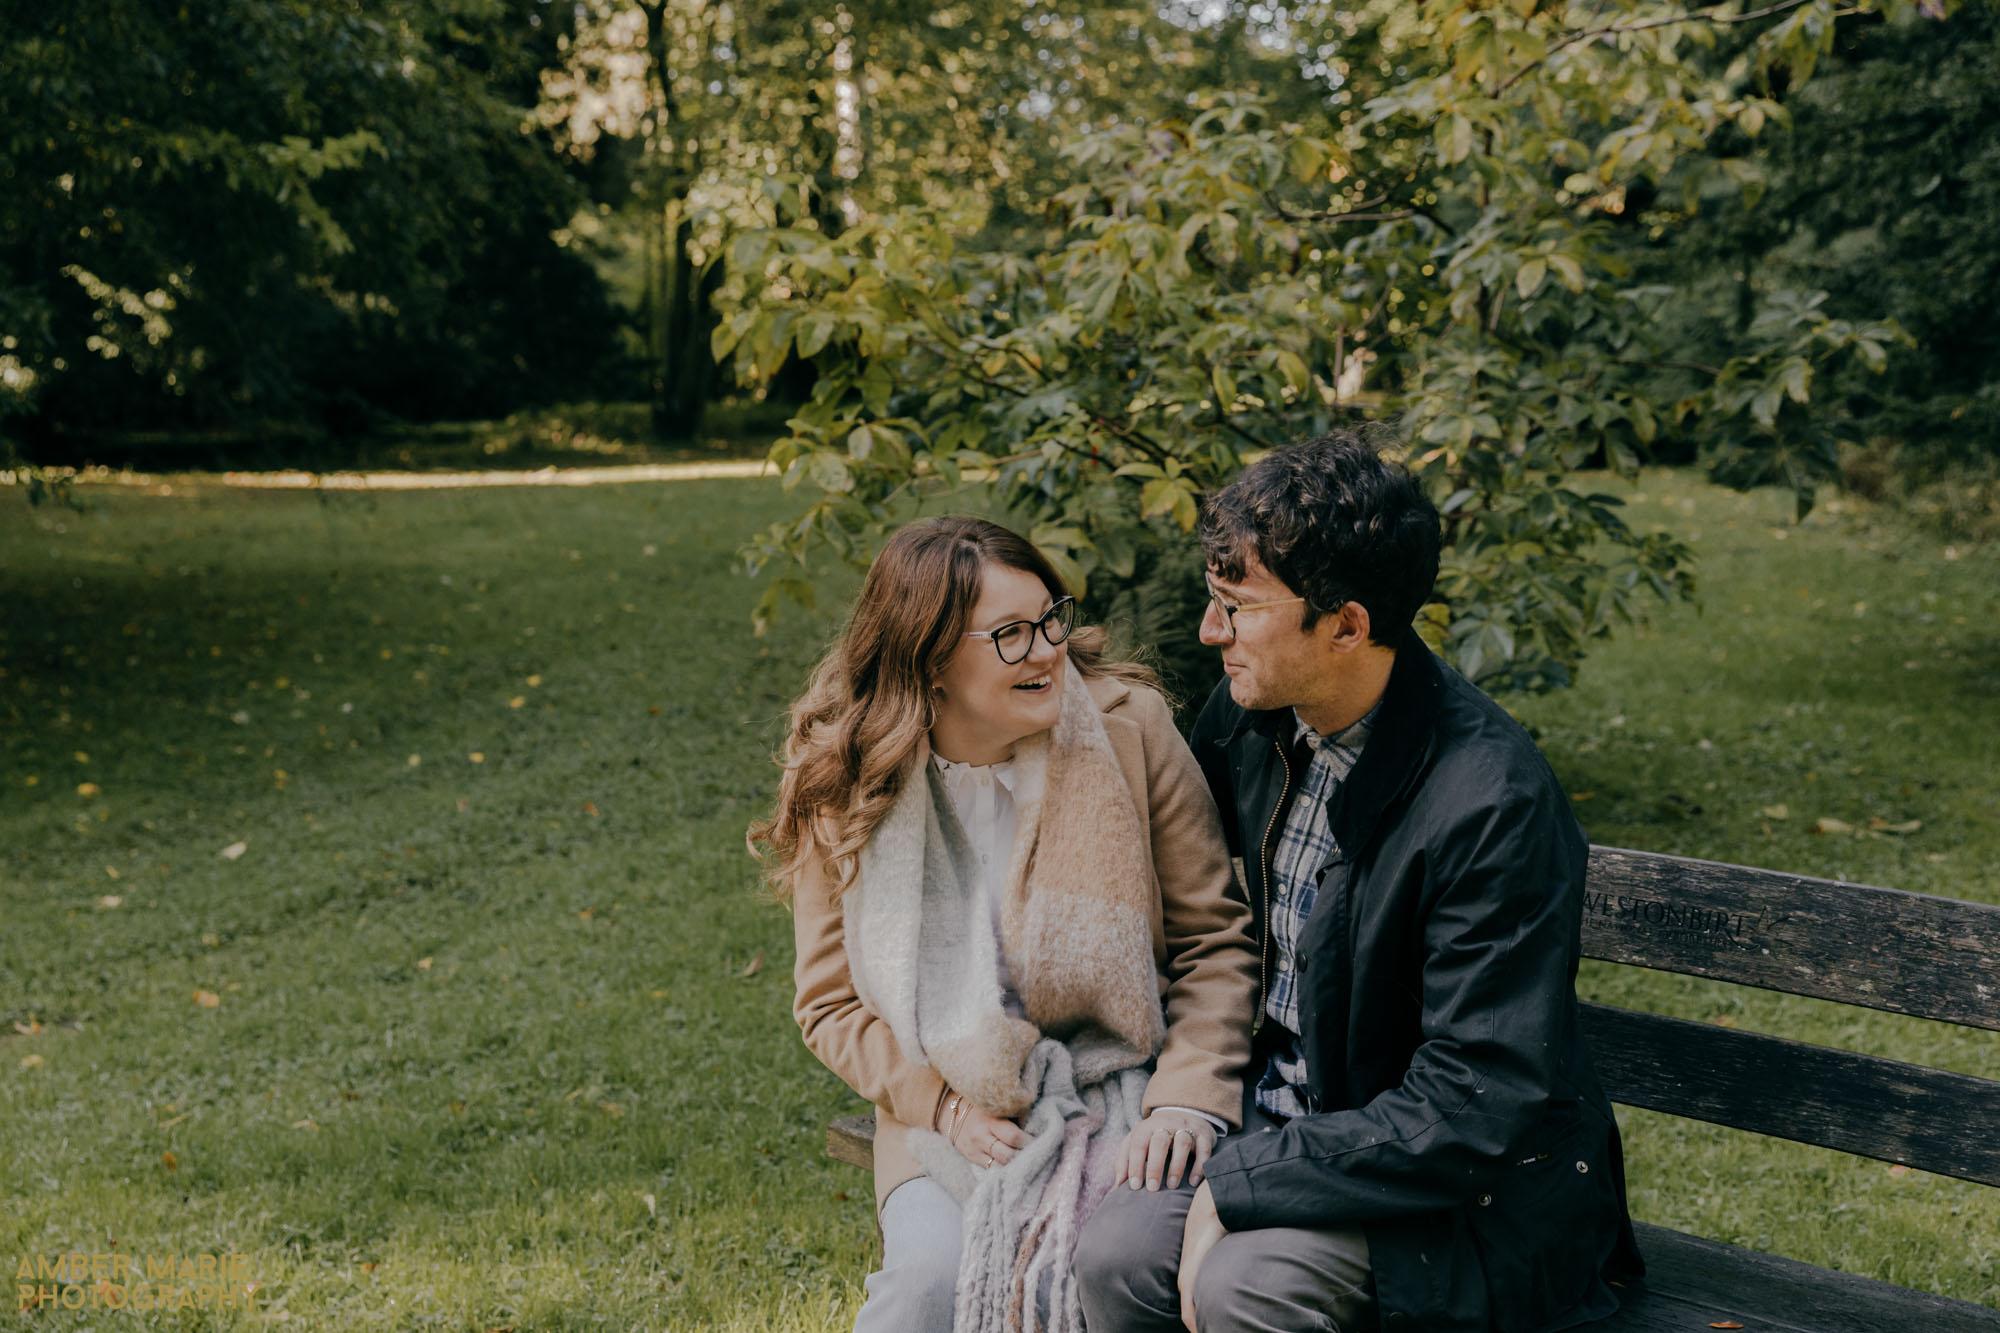 Autumn engagement Photography near Cirencester